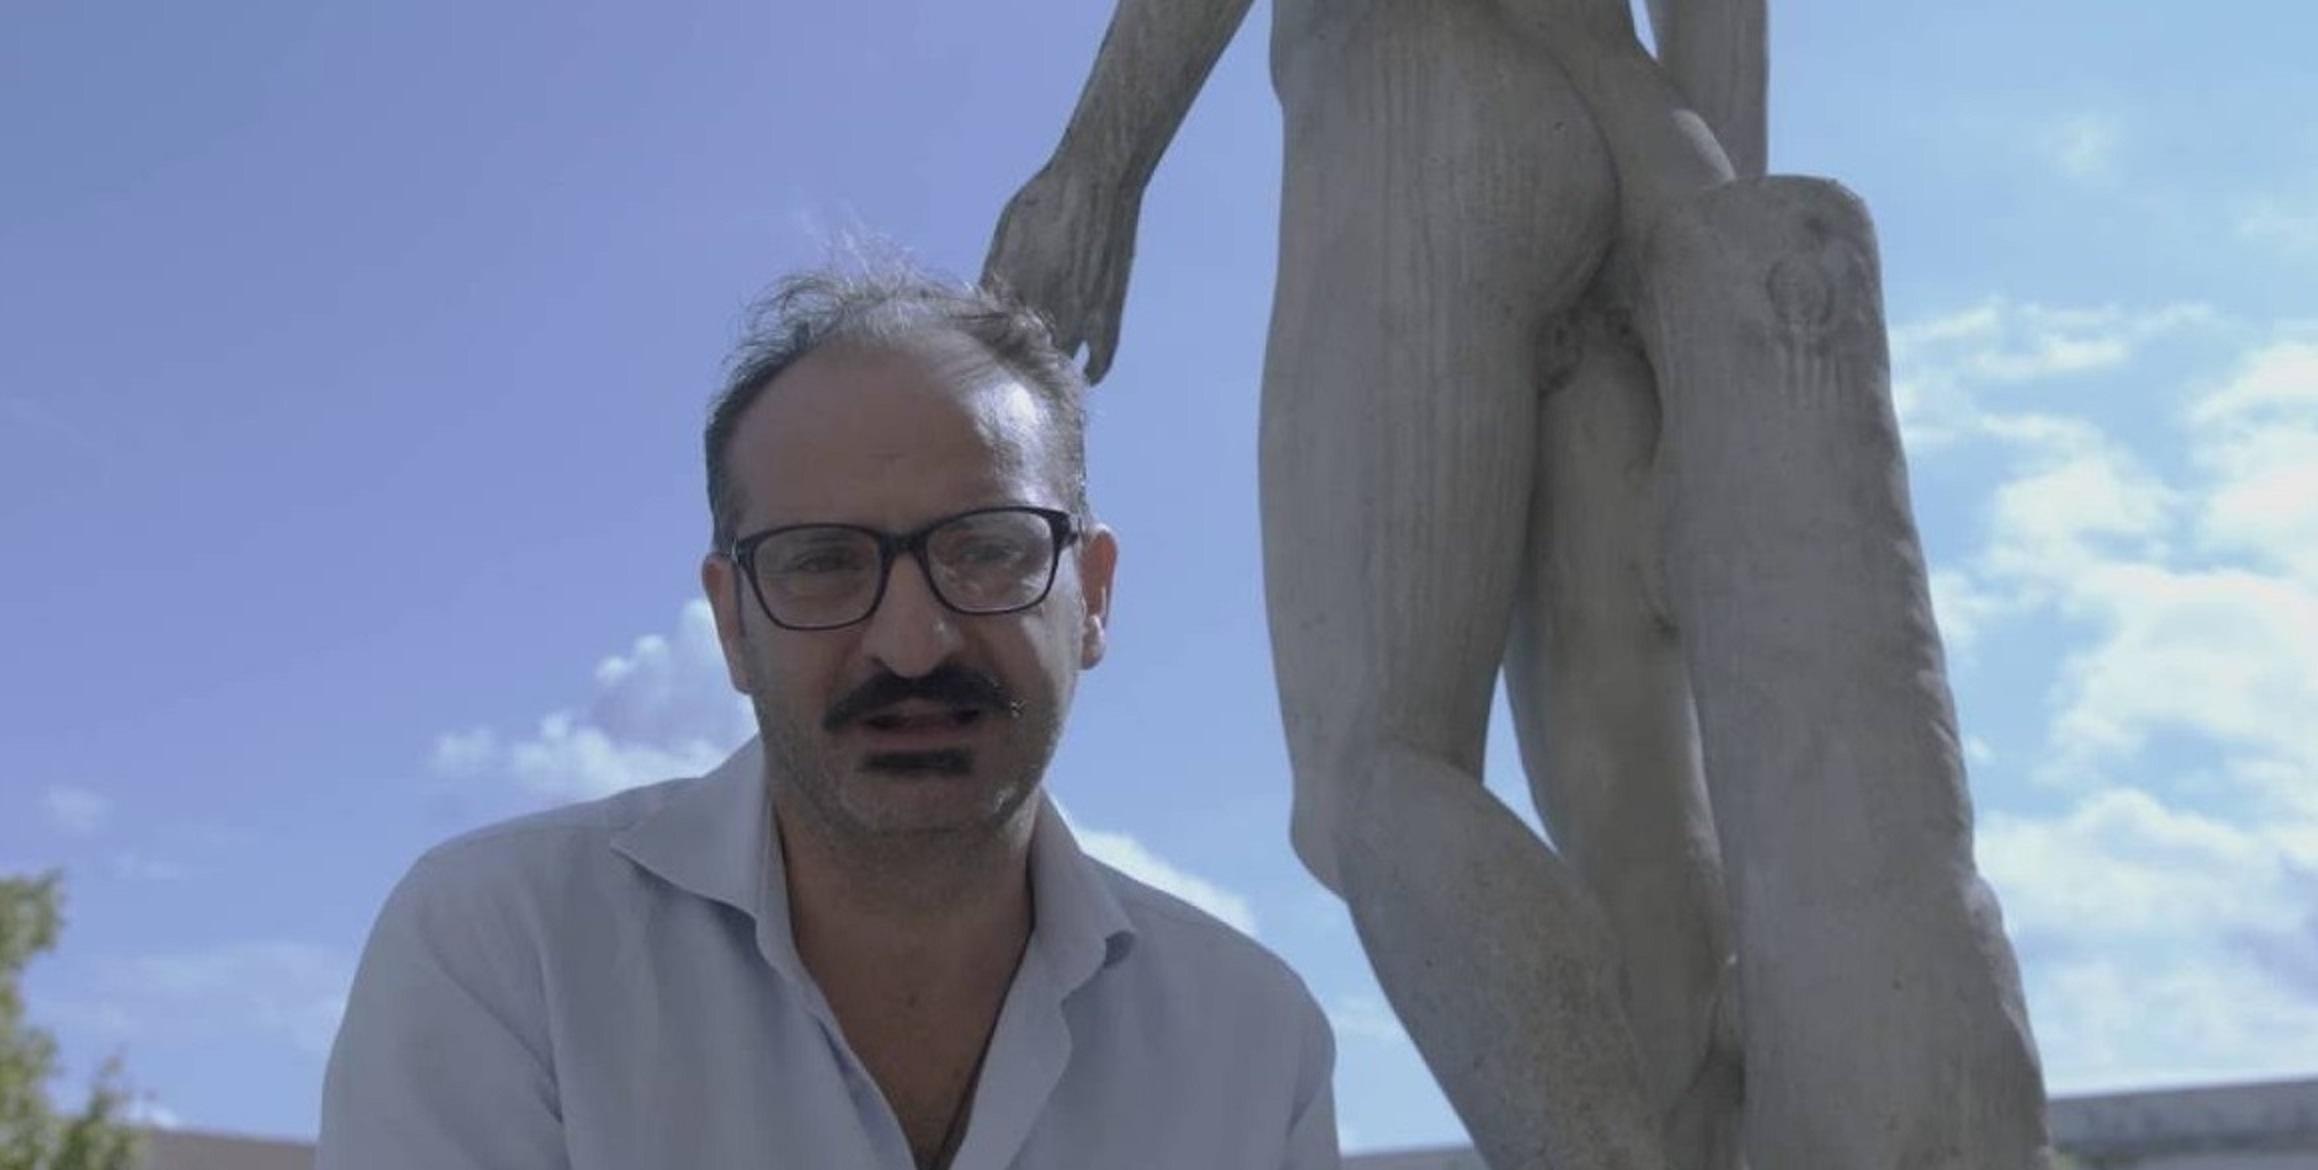 Davide Grittani